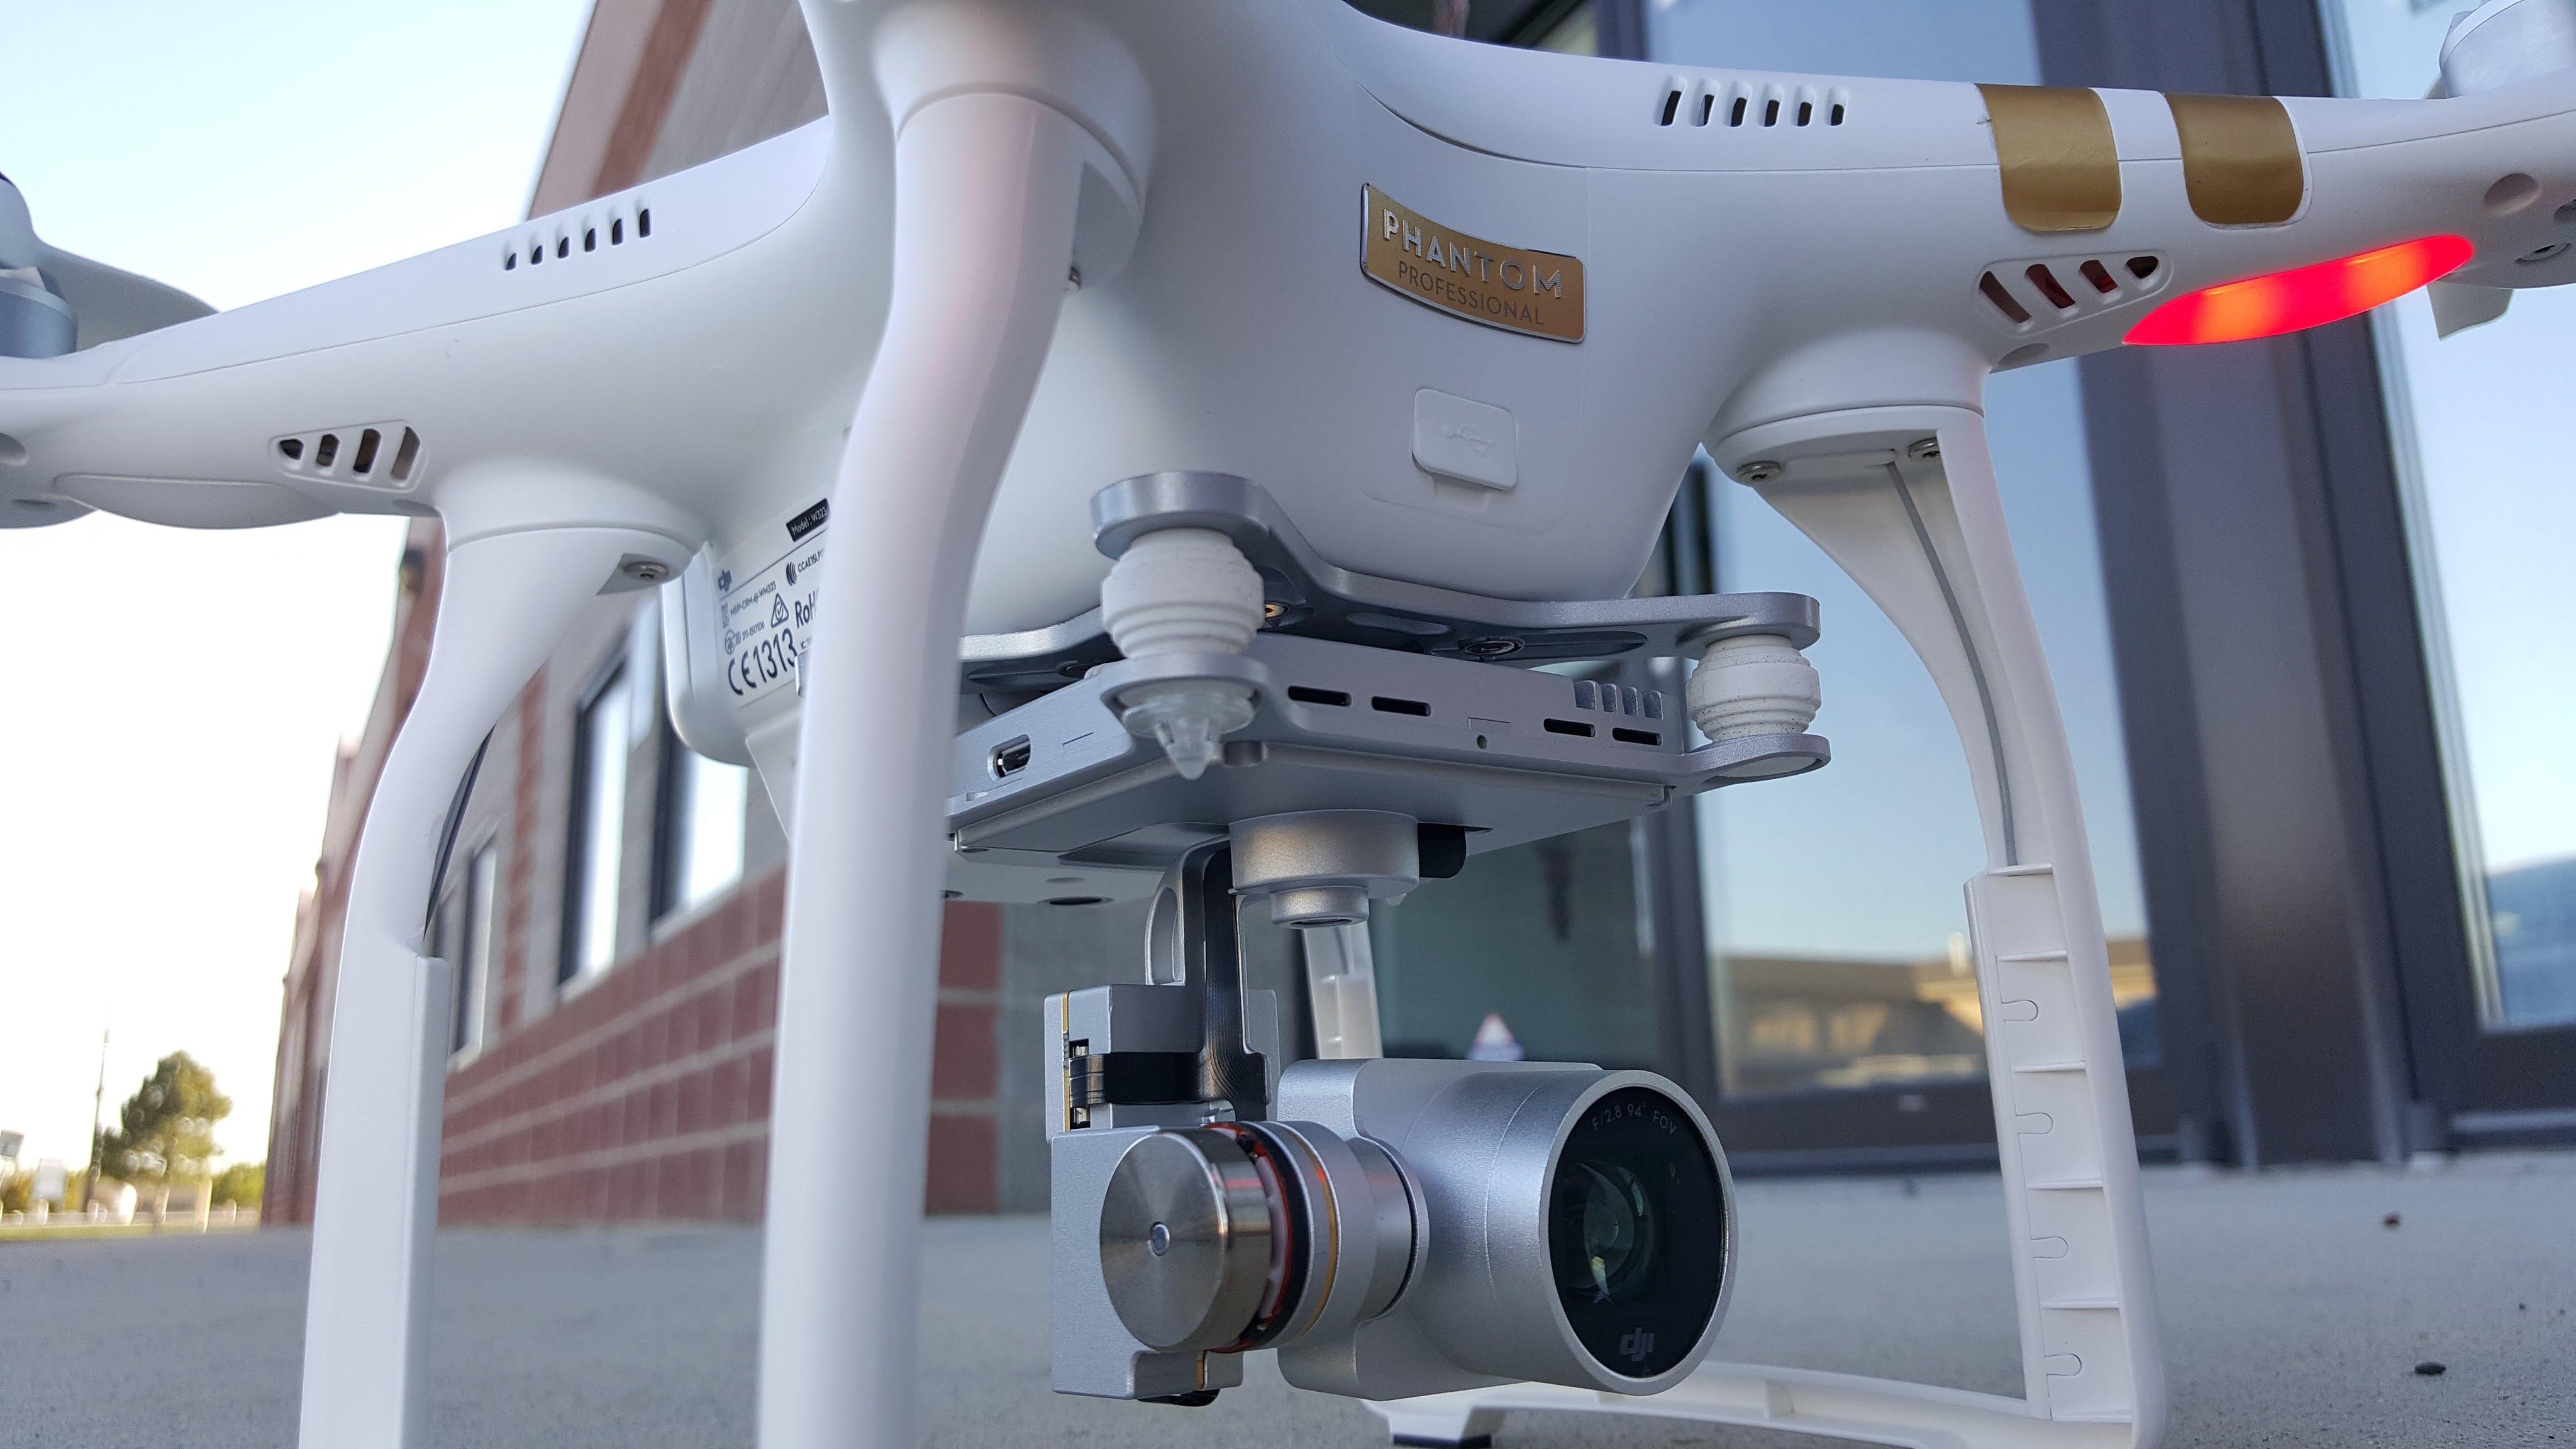 I BOUGHT A DRONE! DJI Phantom 3 Professional Impressions - YouTube